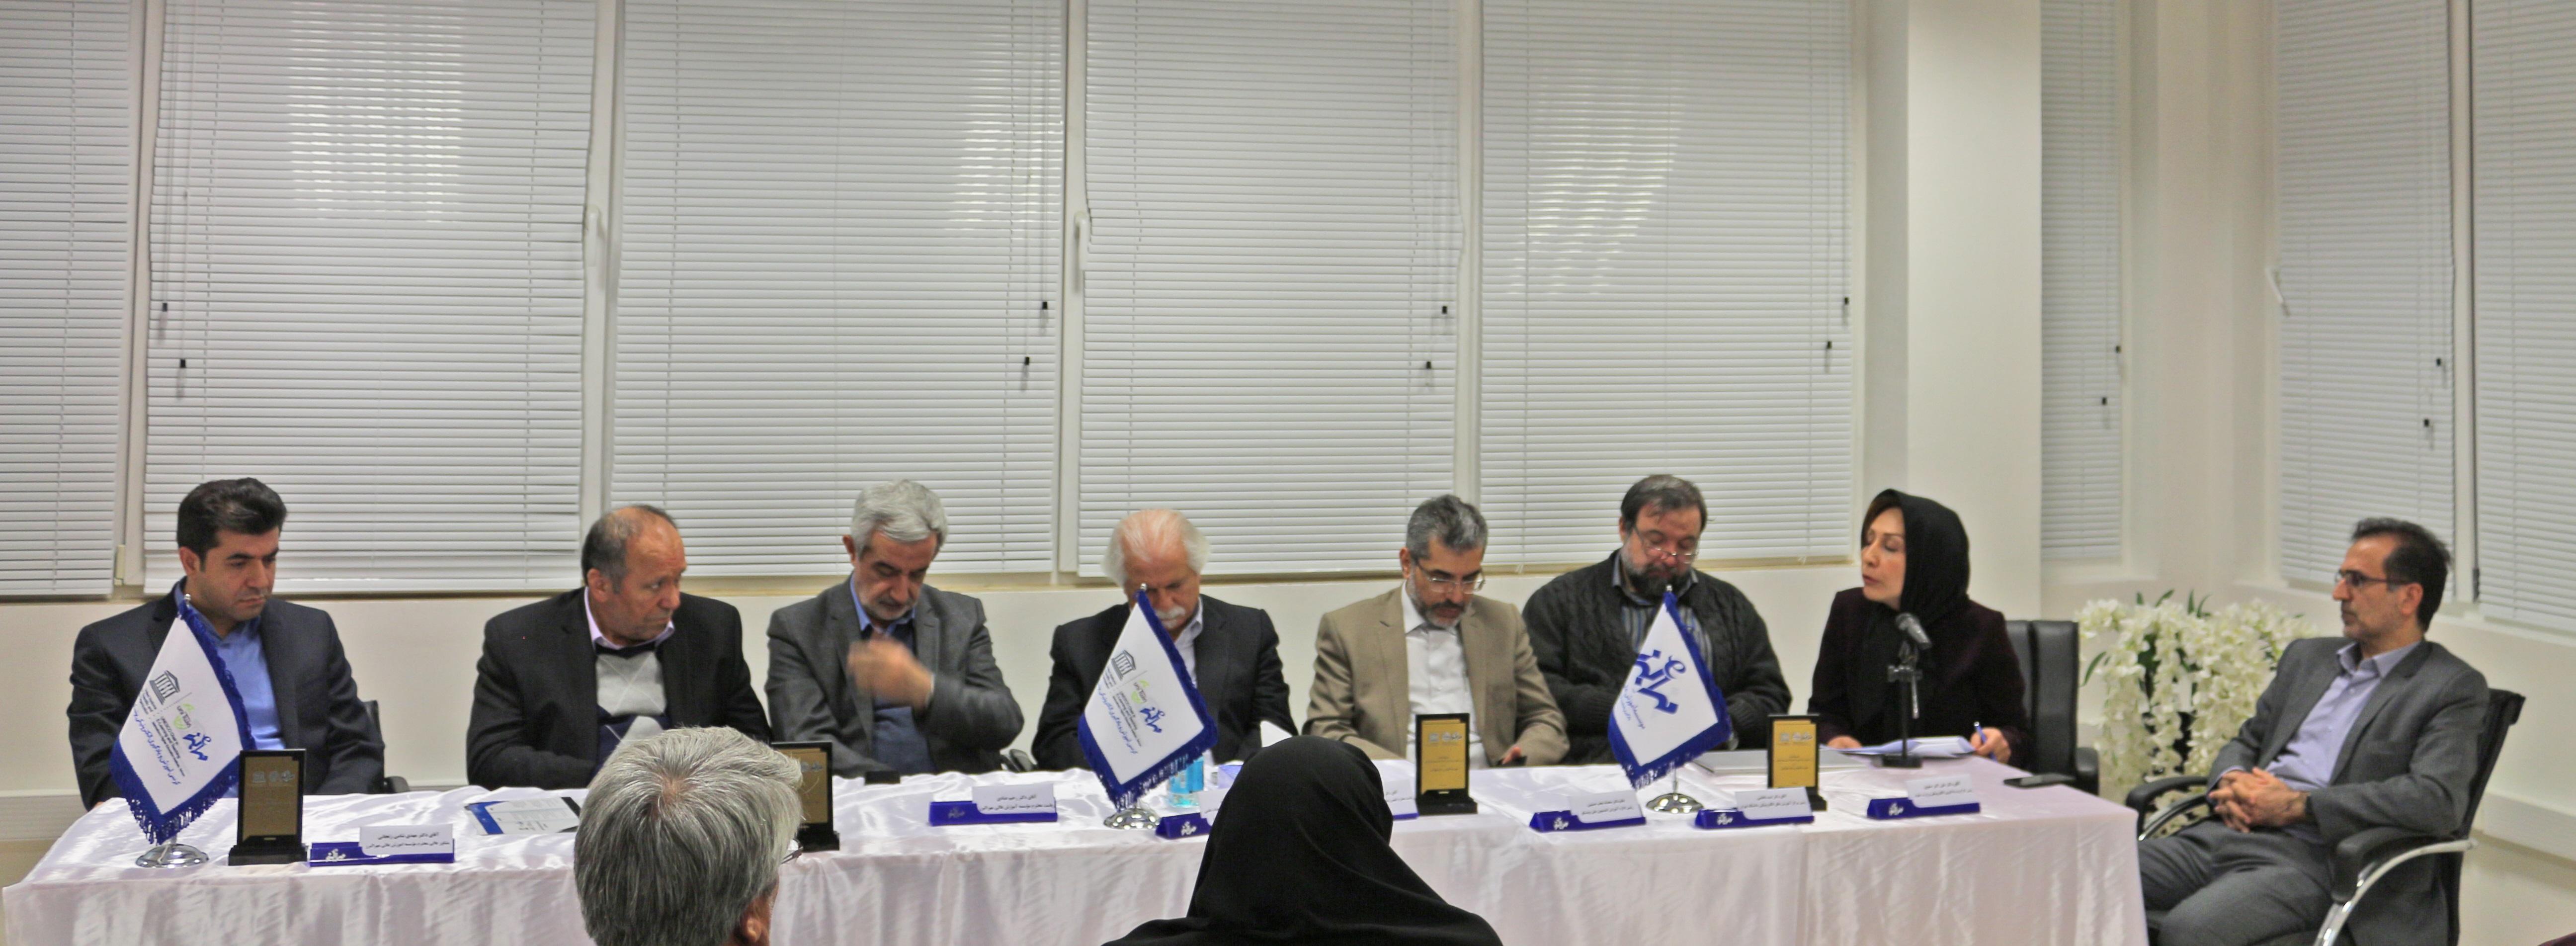 http://ucet.irمیزگرد چالش های یادگیری الکترونیکی در ایران و مأموریت های کرسی آموزش و یادگیری الکترونیکی در رفع این چالش ها